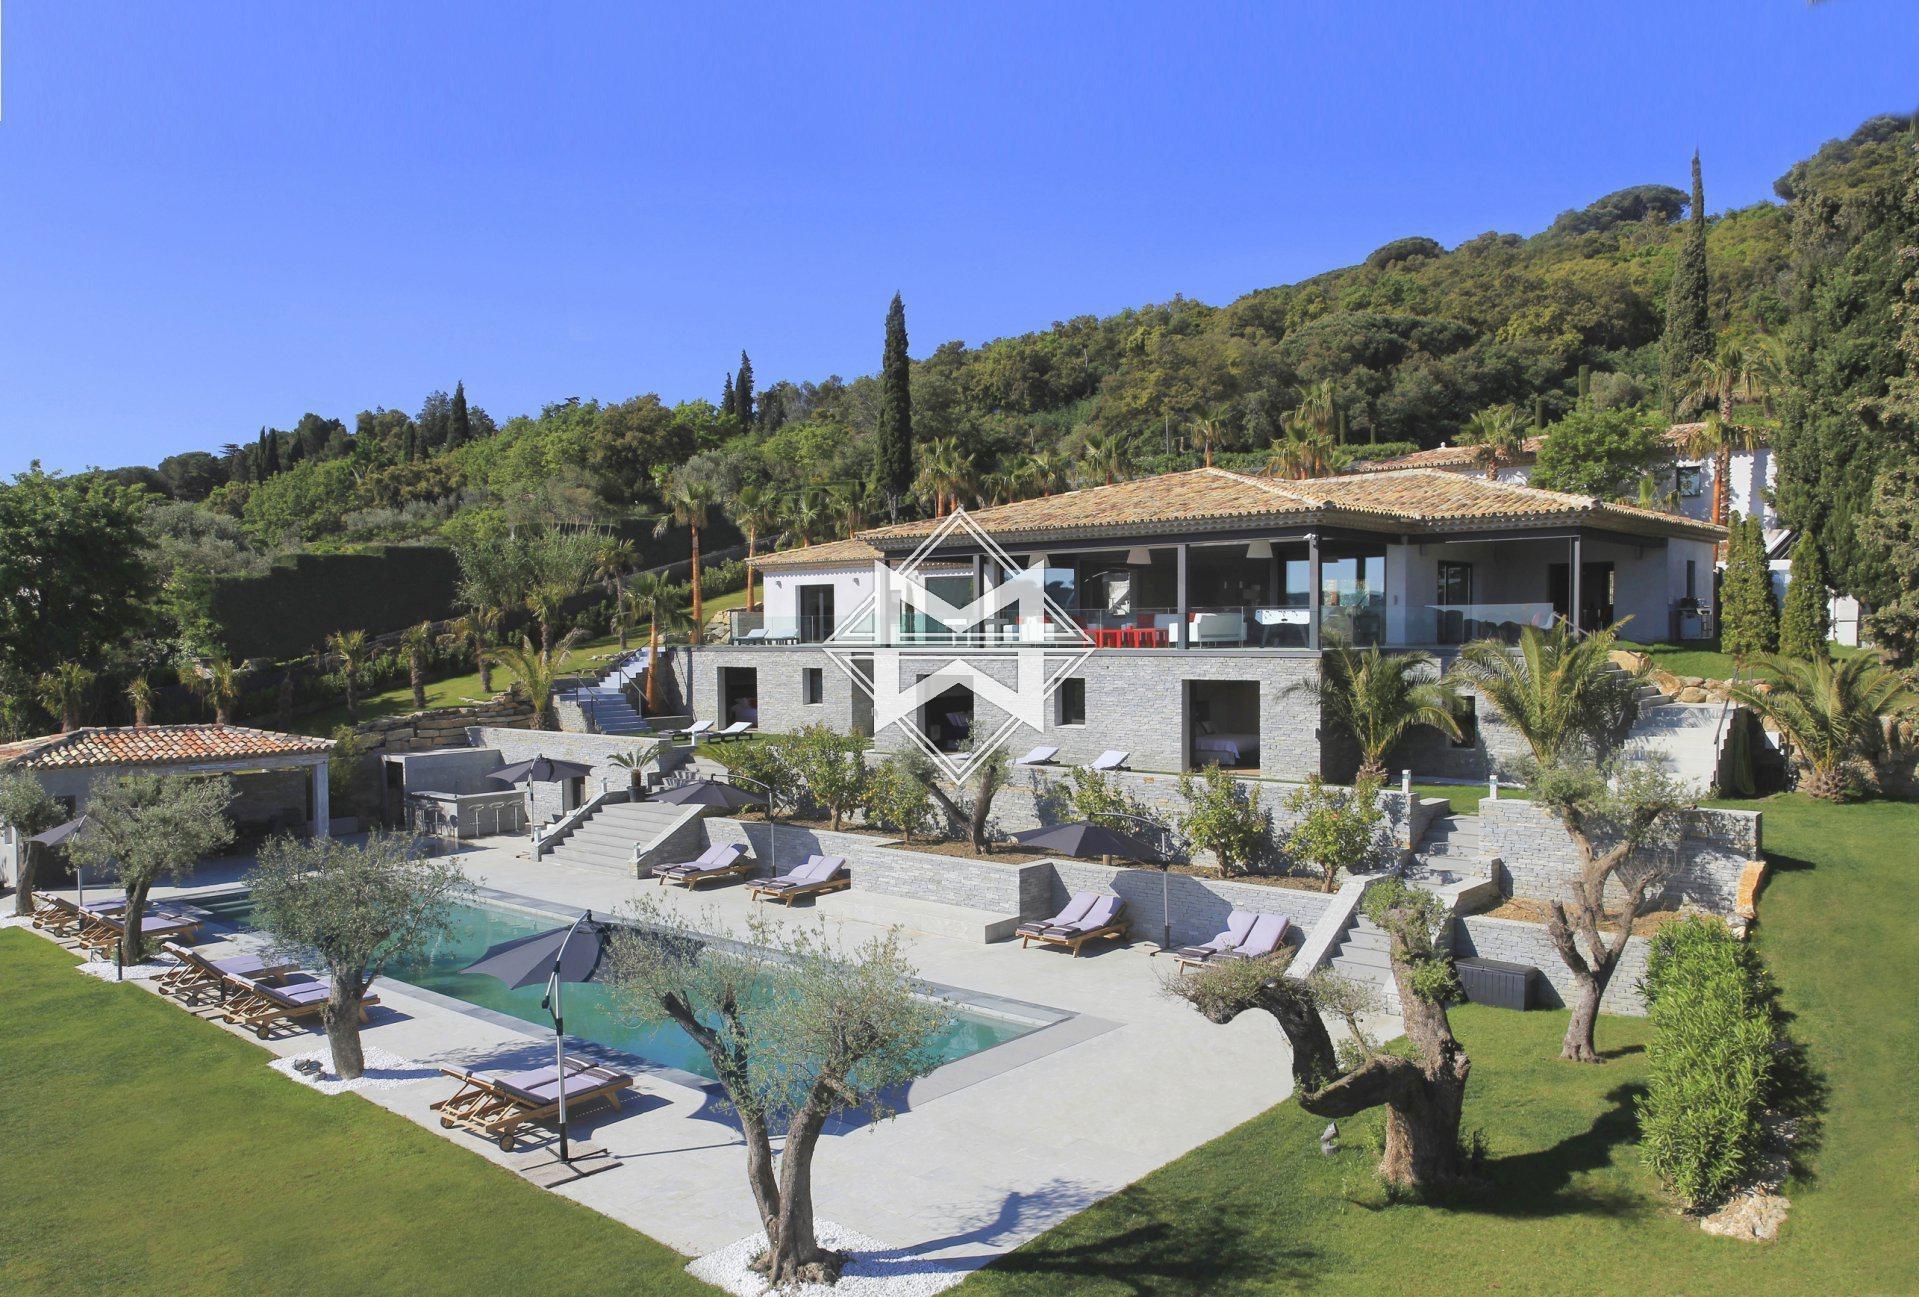 Villa in Saint-Tropez, France 1